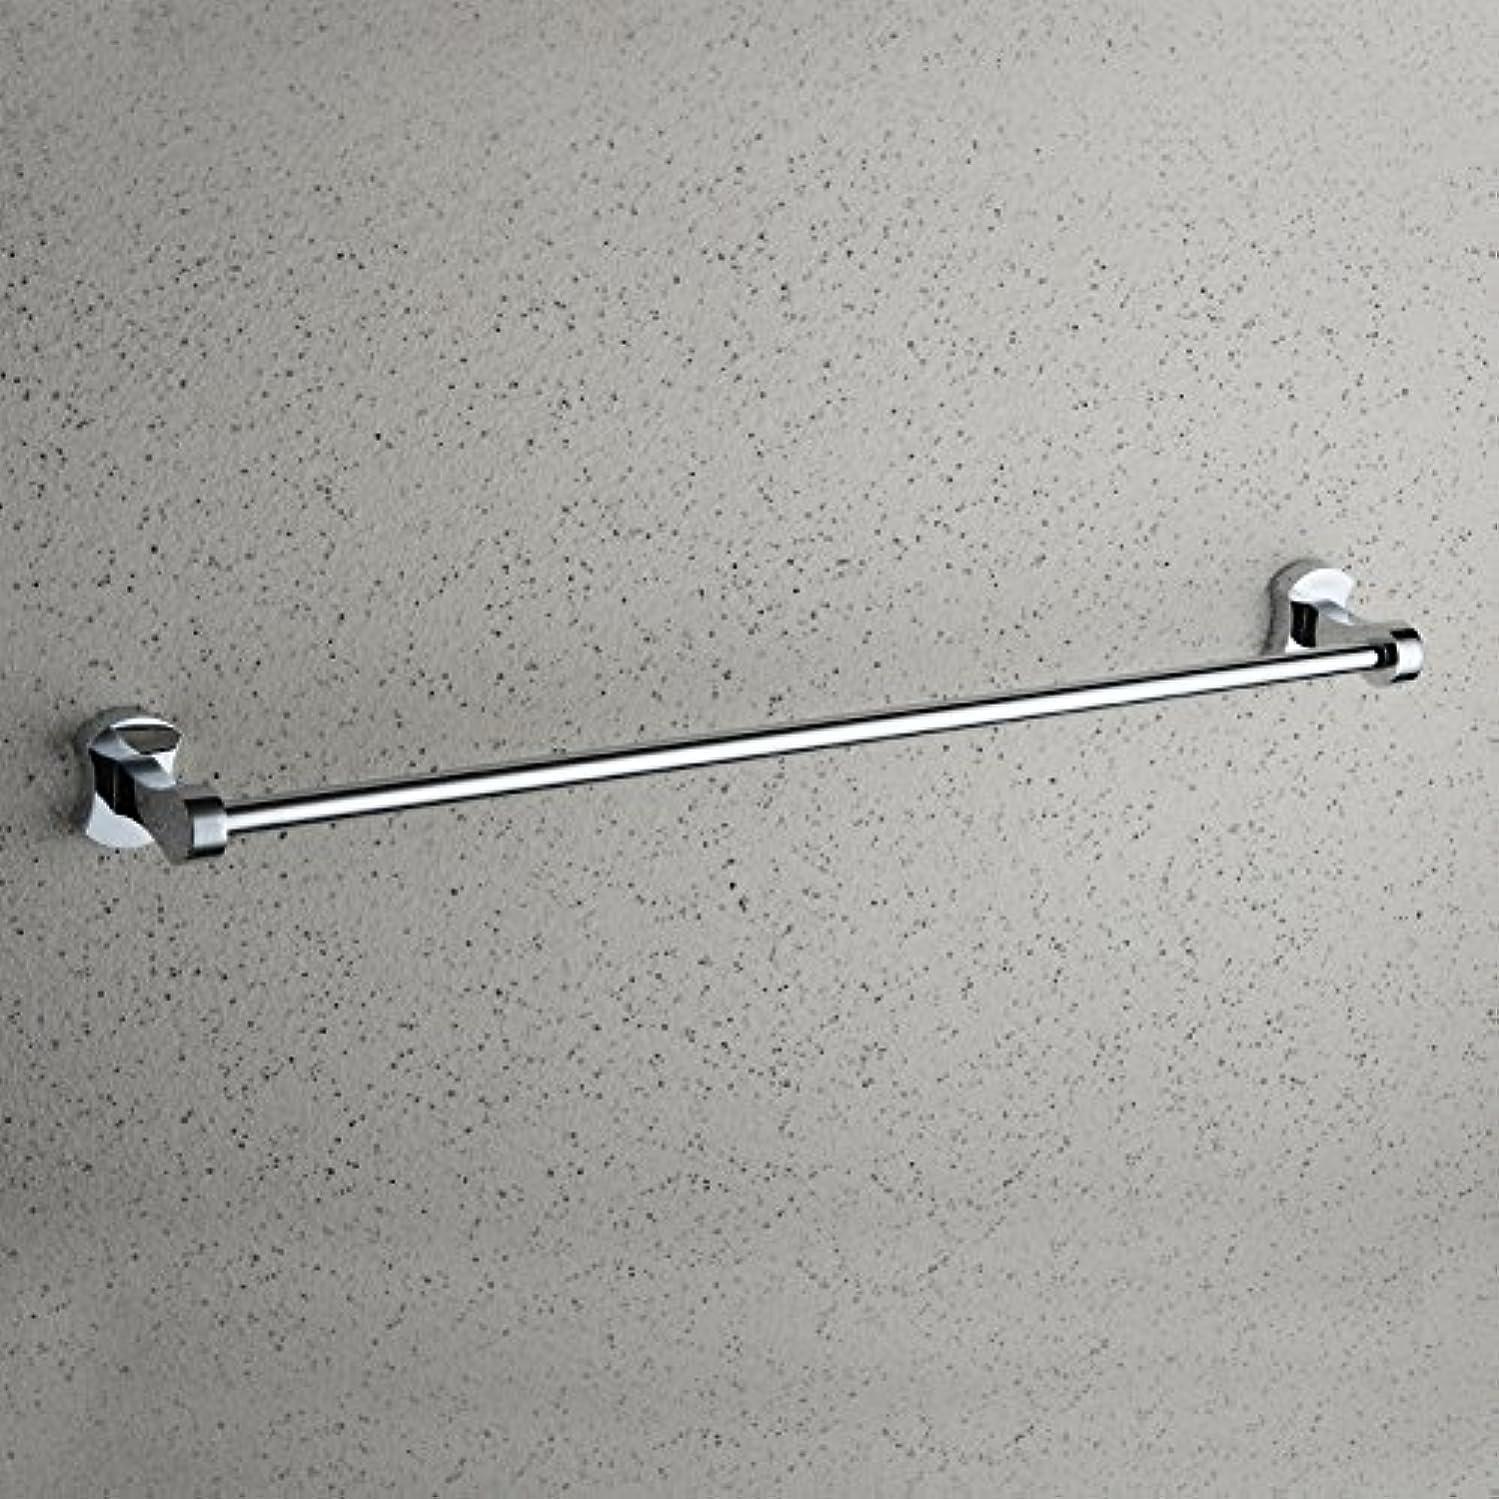 Hiendure Bathroom Copper Chrome 20 inch Single Towel Bars